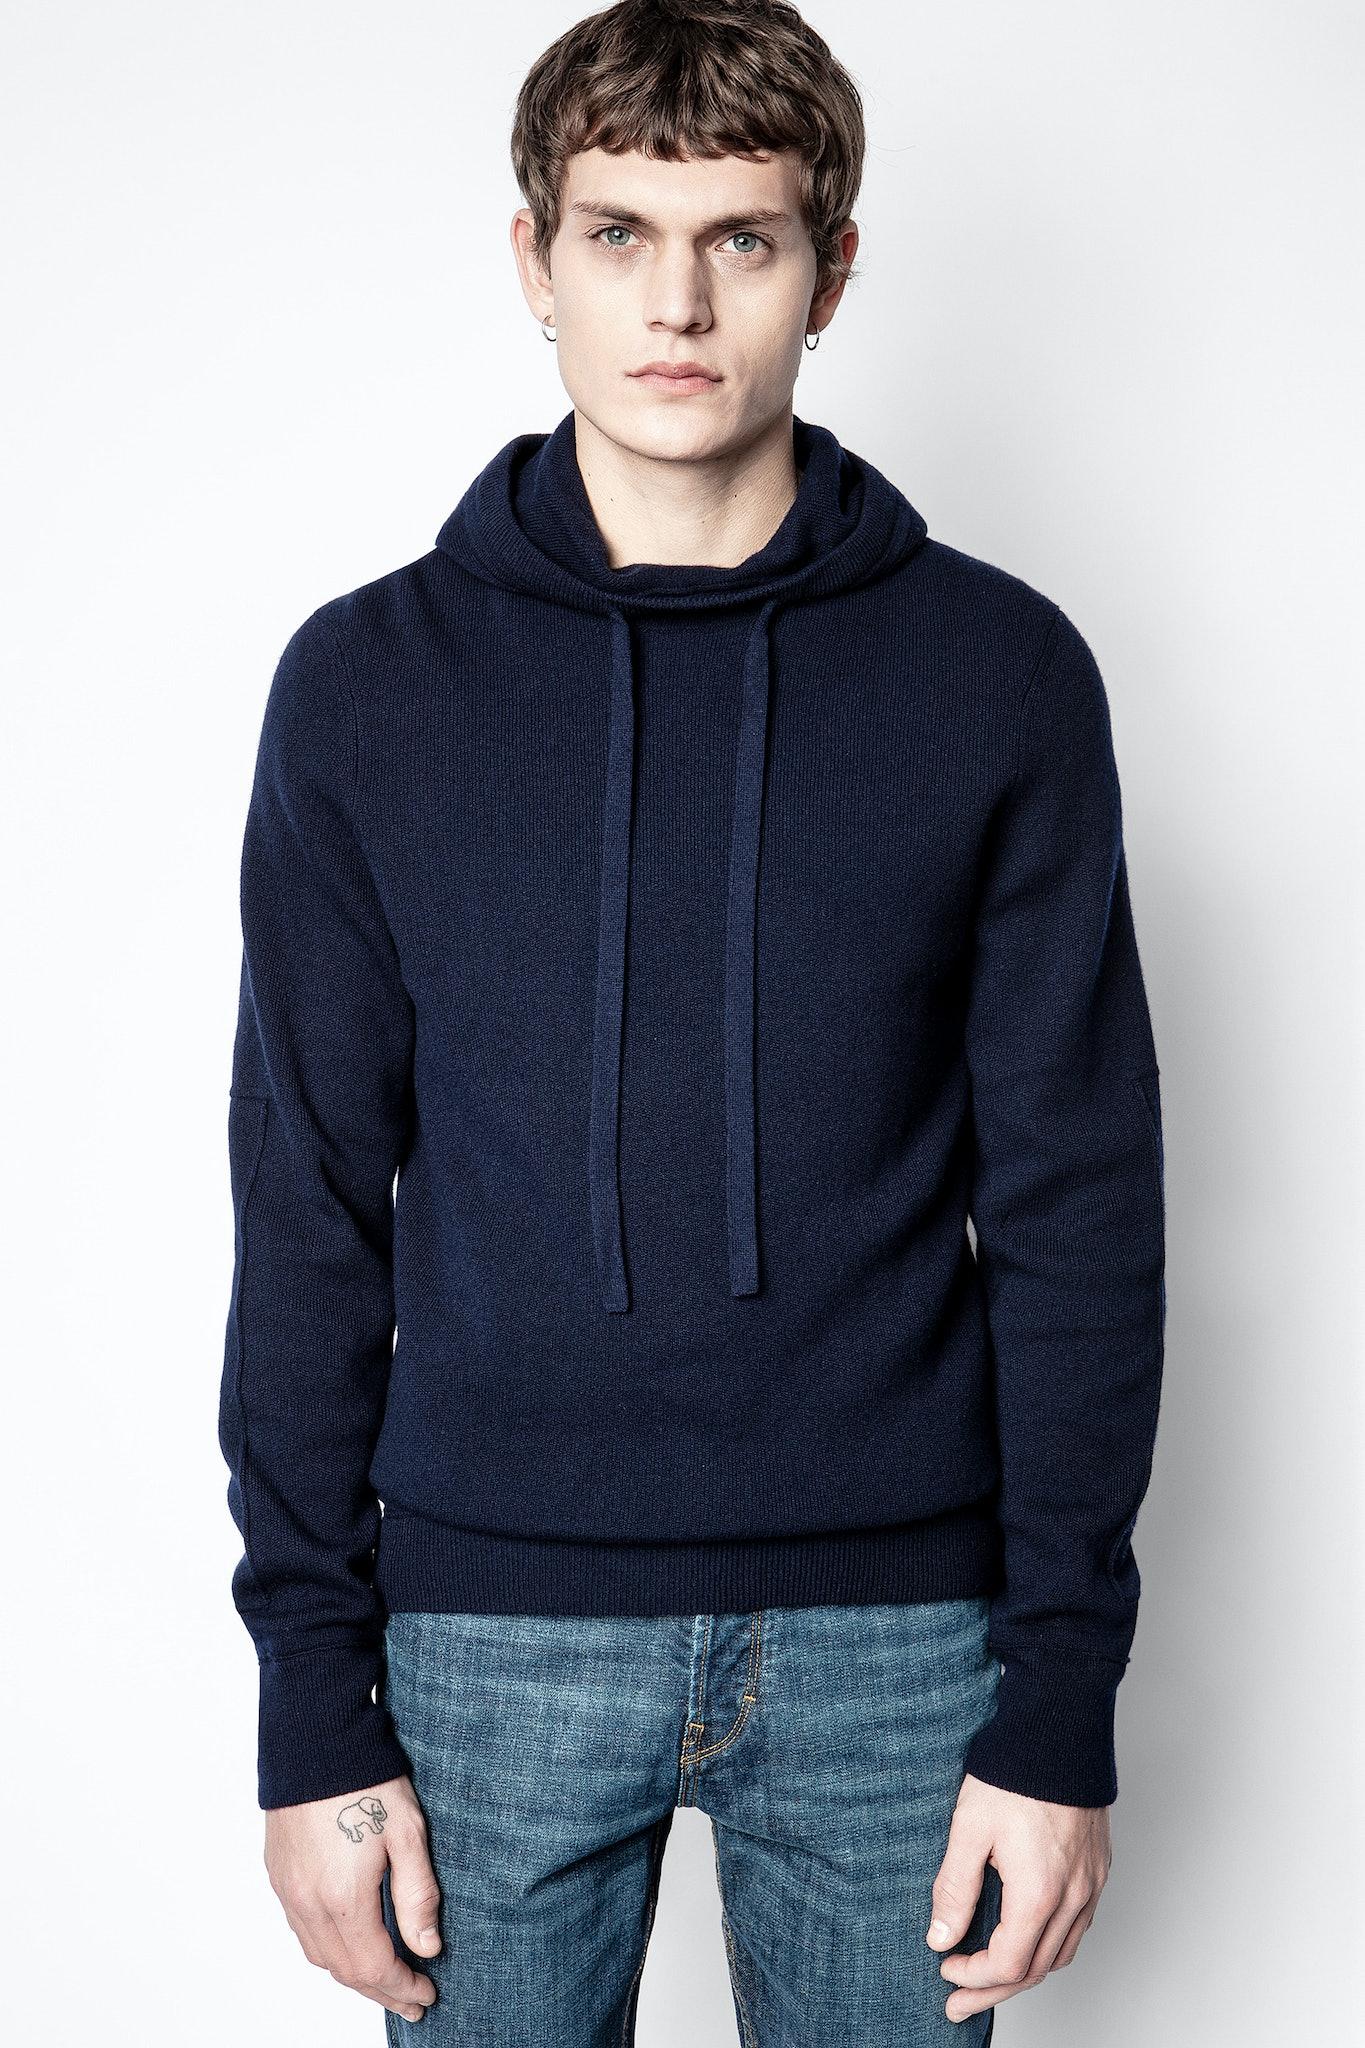 Hewitt Sweater